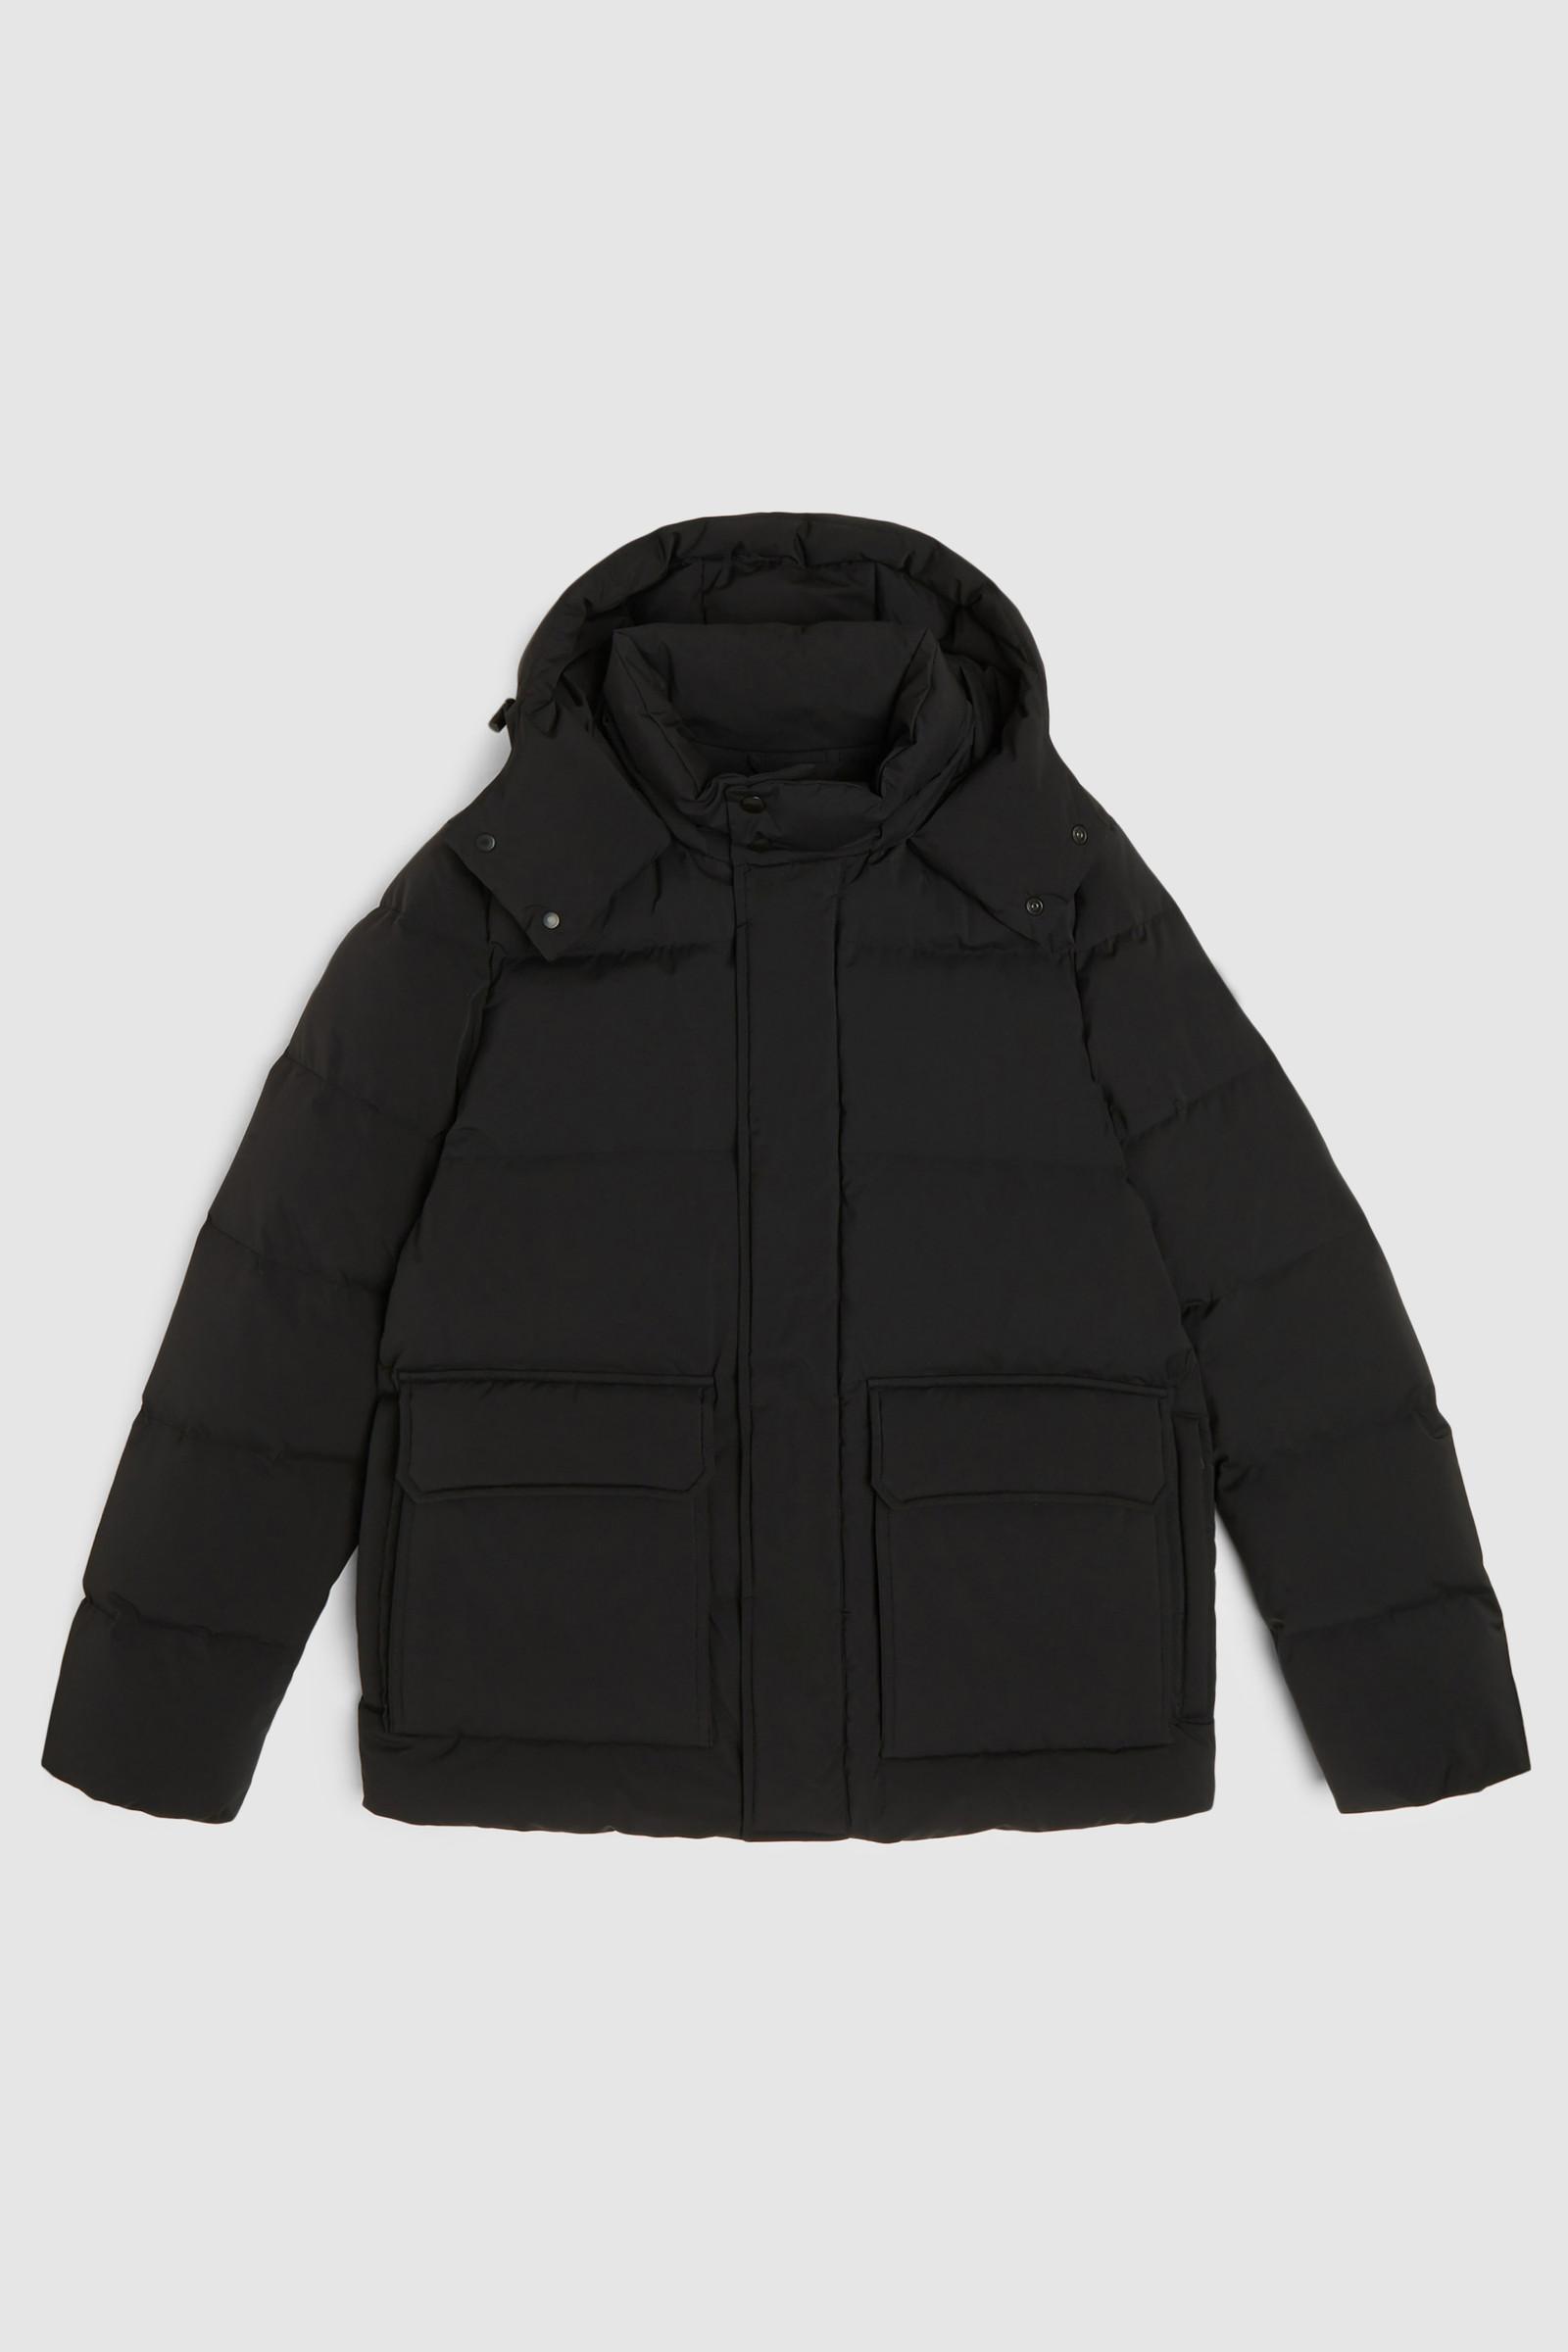 Sierra Short Jacket With Detachable Hood